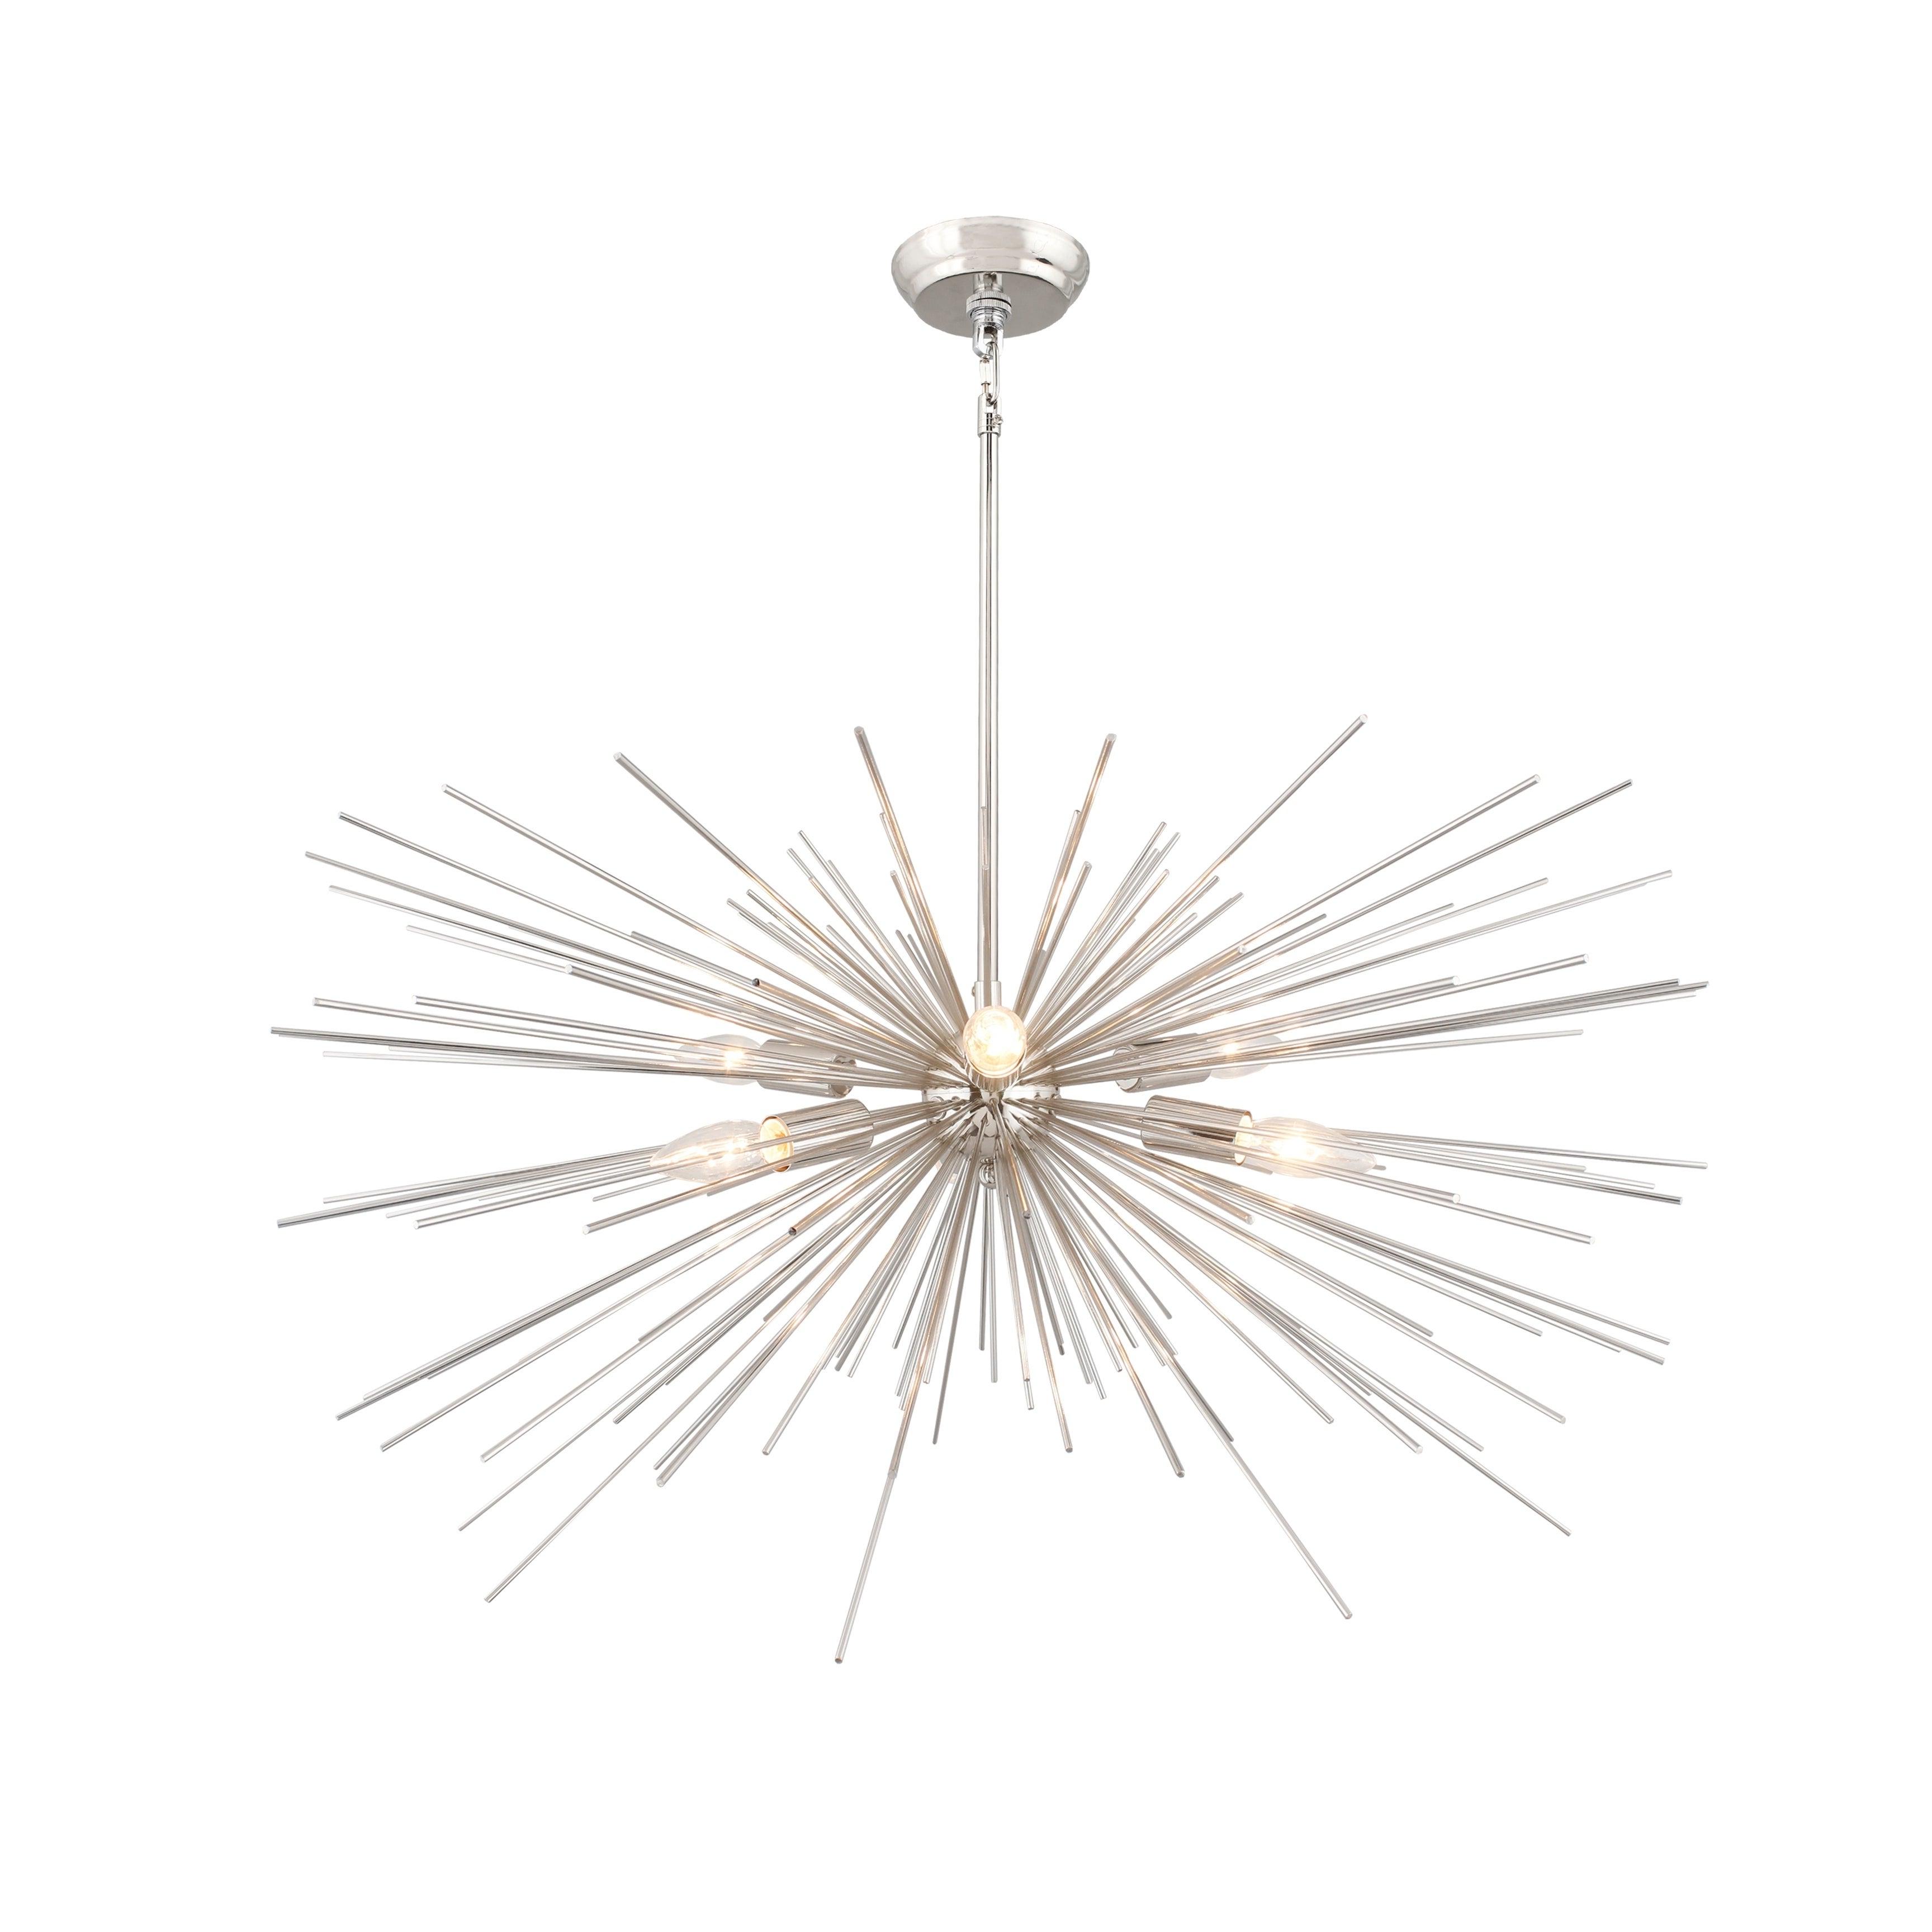 Most Current 6 Light Sputnik Chandelier In Nickel Finish Throughout Johanne 6 Light Sputnik Chandeliers (View 20 of 25)